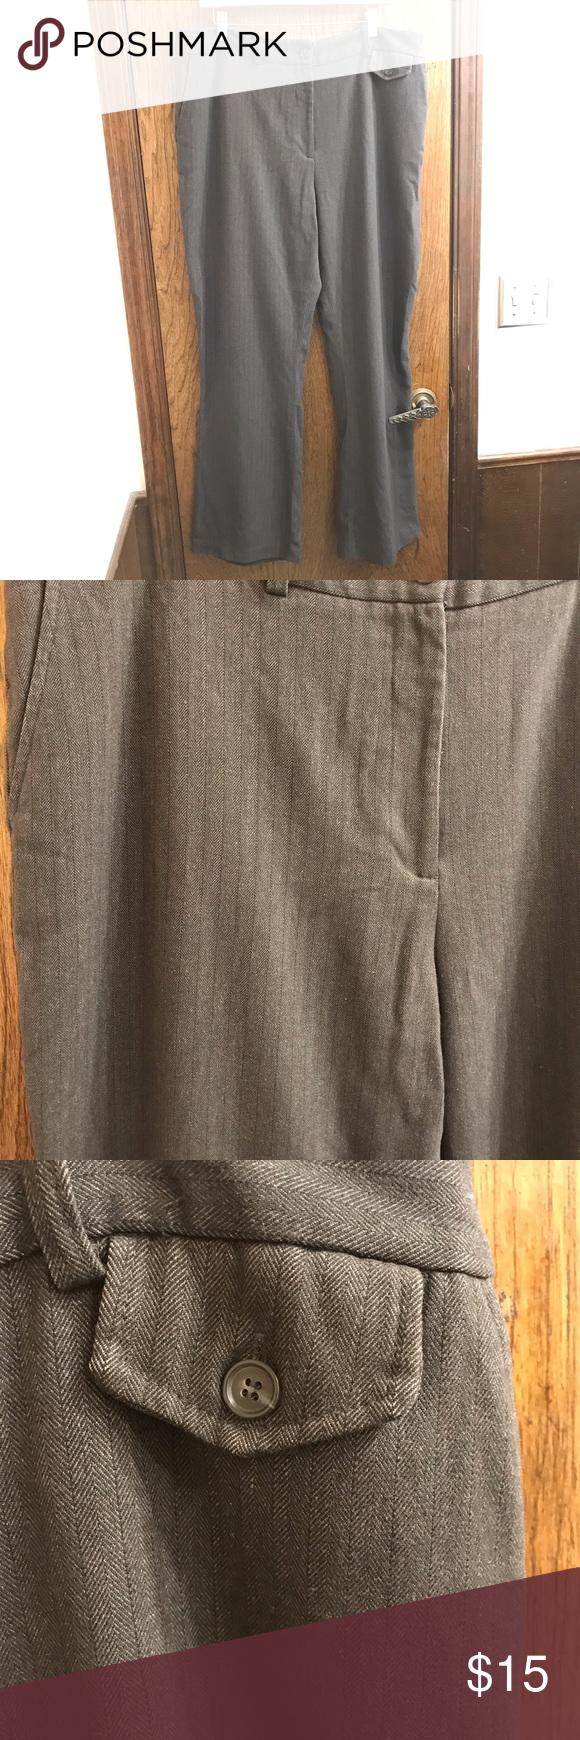 bb3ae09afaf9 East 5th Gray Dress Pant Slacks Size 18 A nice pair of gray East 5th dress